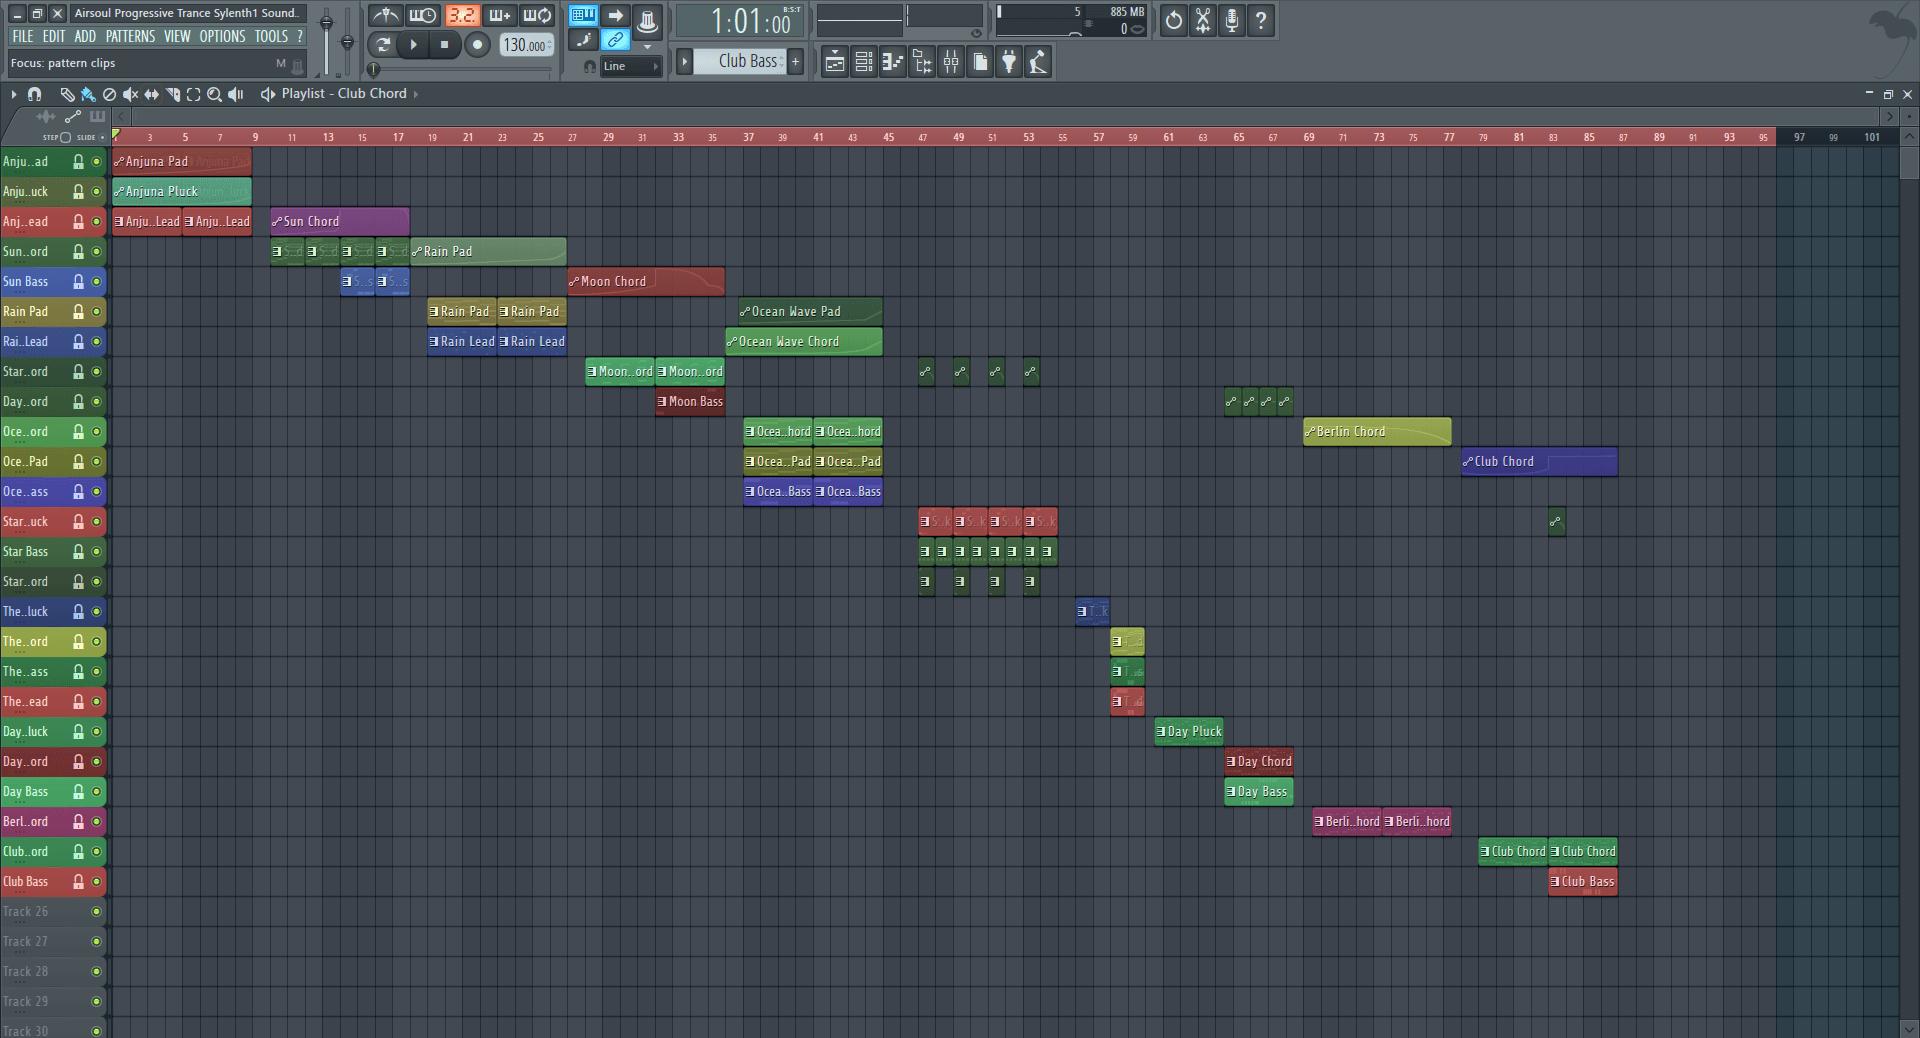 airsoul-vol-2-fl-studio-demo-soundset